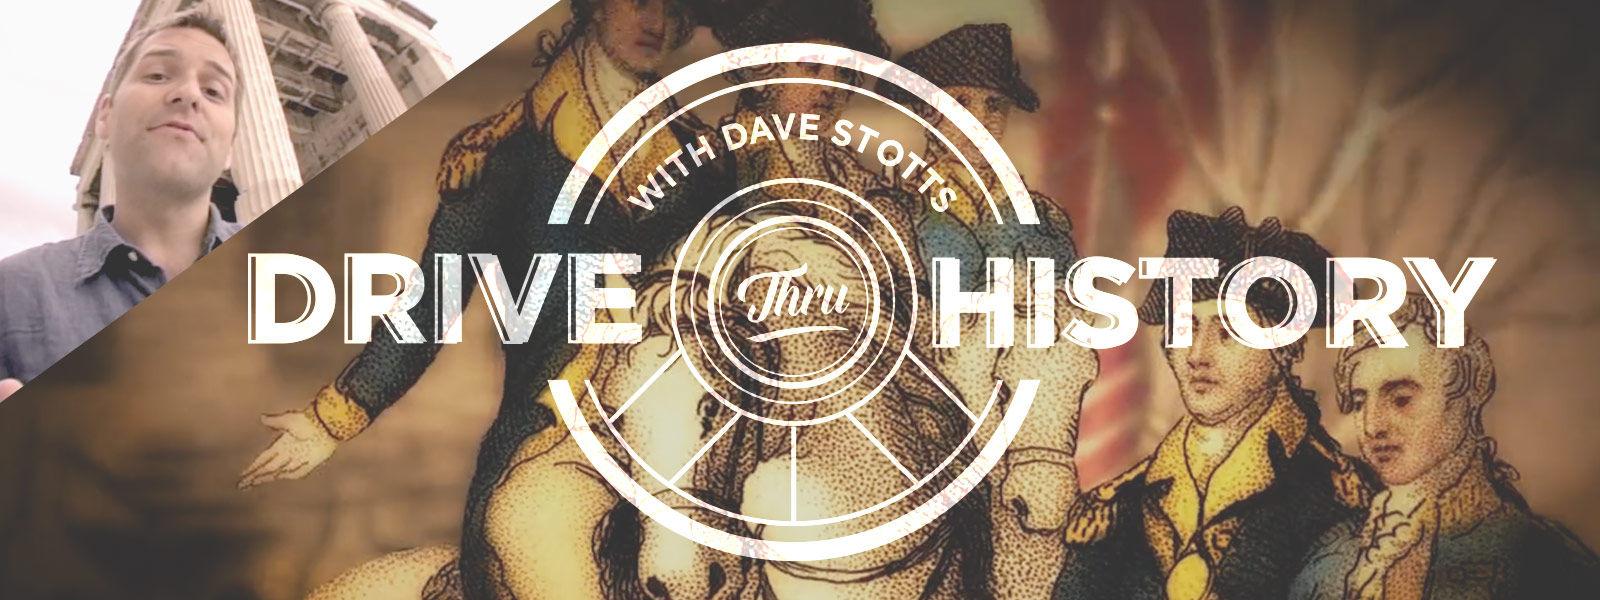 Drive Thru History Dave Stotts